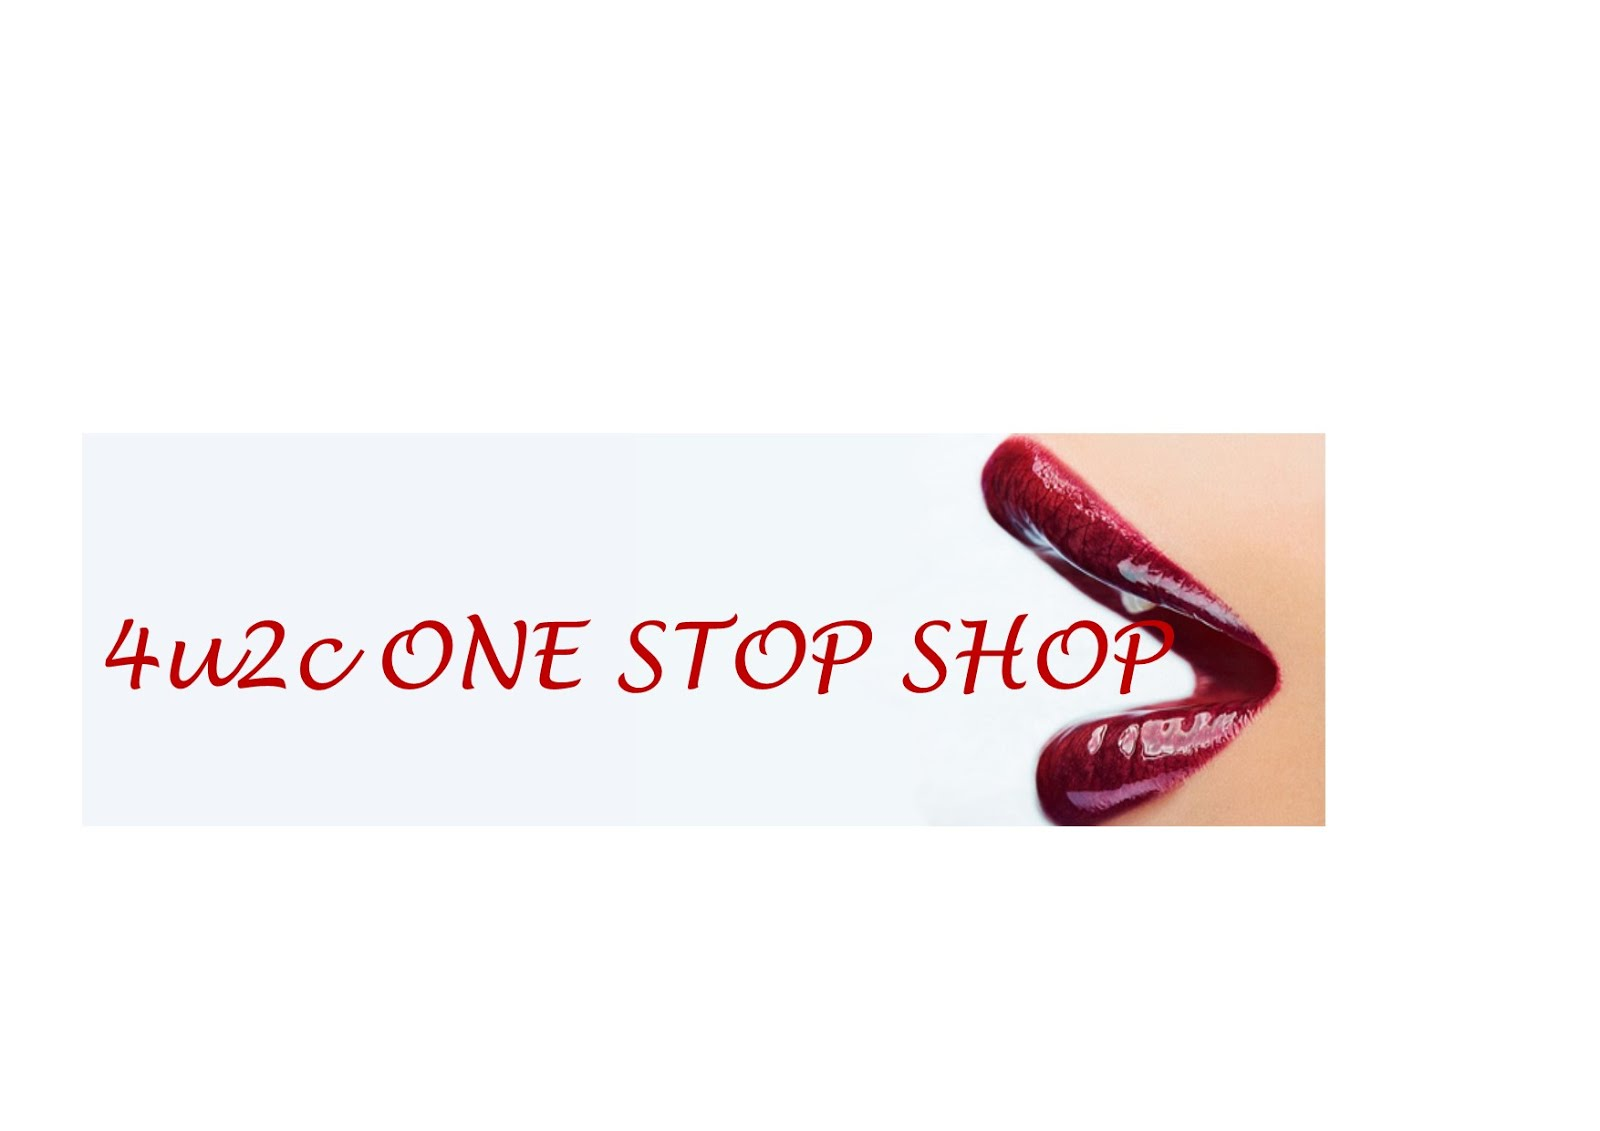 4u2c One Stop Shop